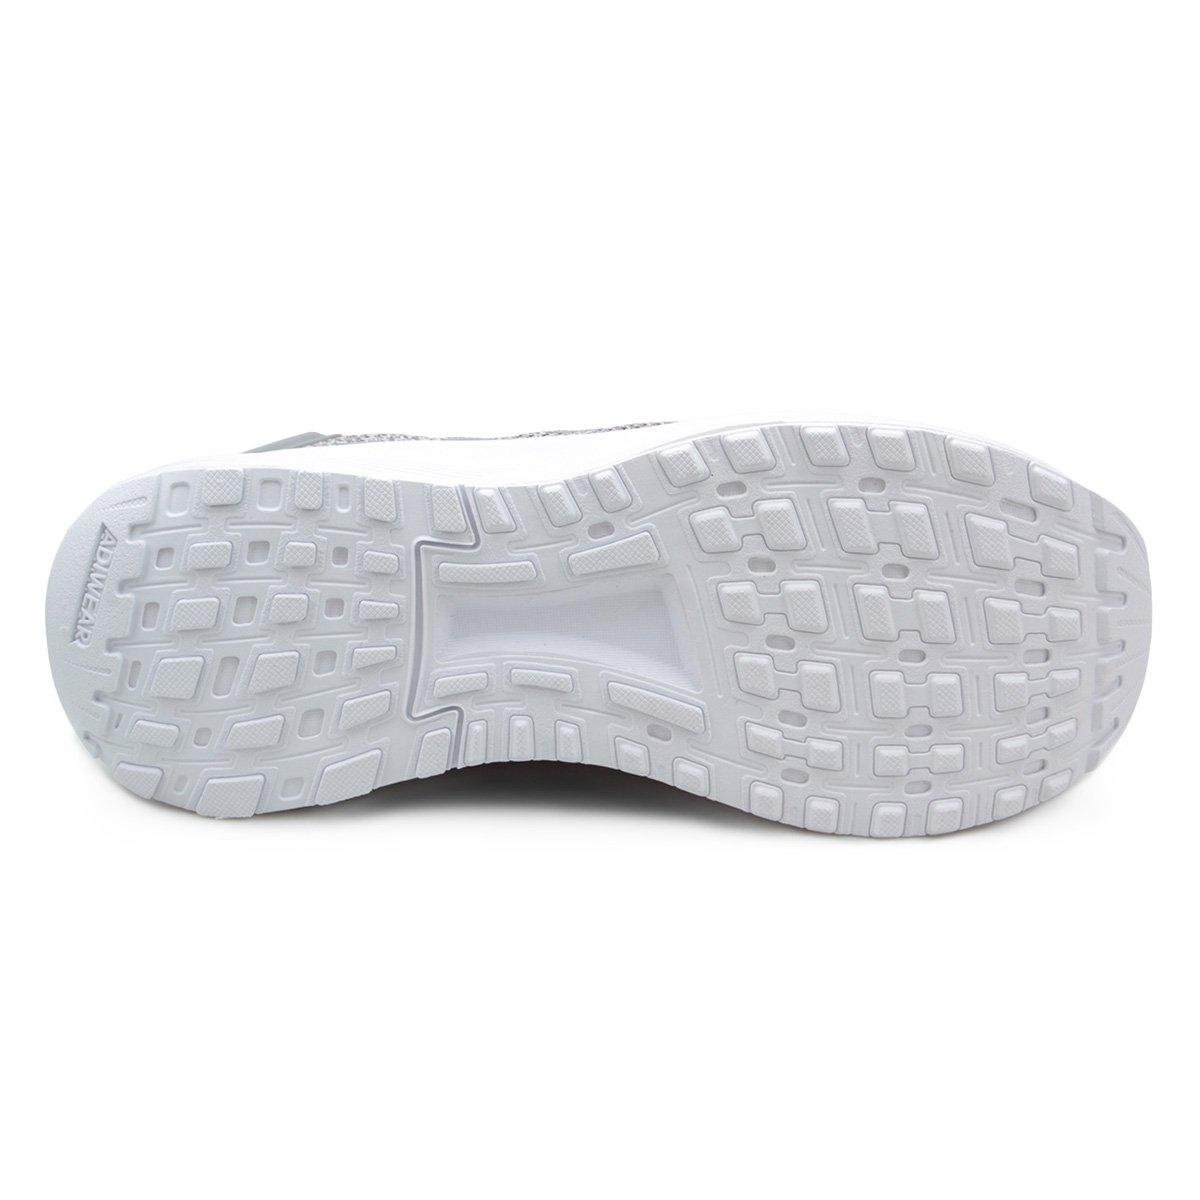 144a47dae1e49 Tênis Adidas Duramo 9 Masculino - Tam: 38 - Shopping TudoAzul